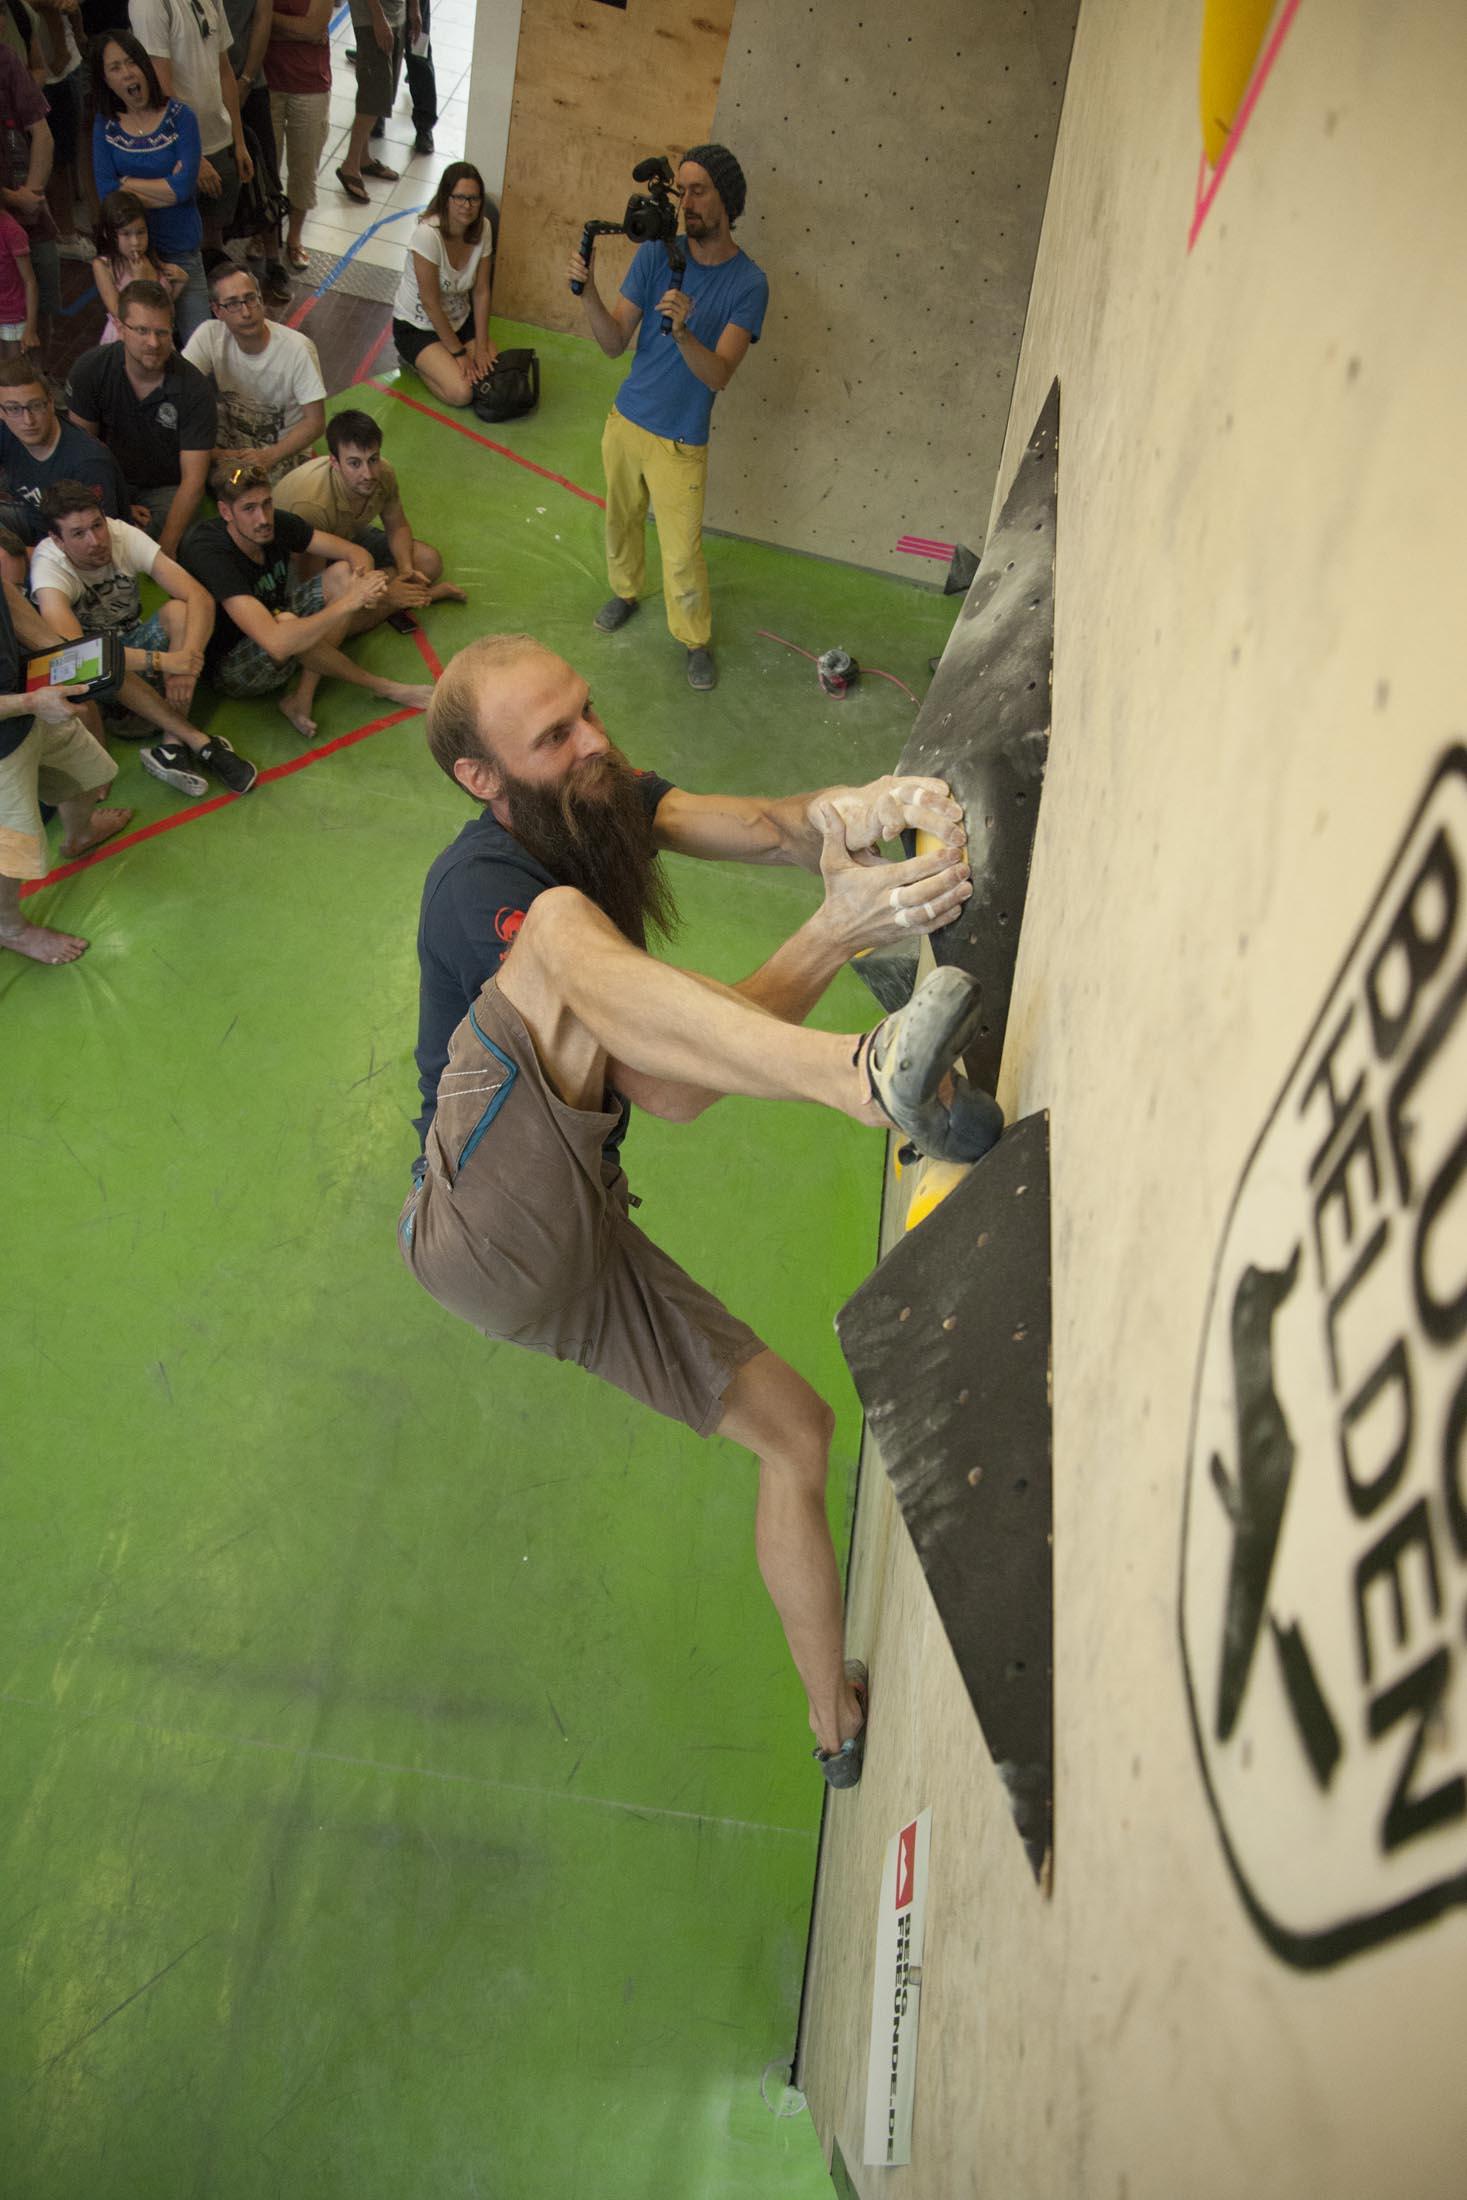 Finale, internationaler bouldercup Frankenjura 2016, BLOCKHELDEN Erlangen, Mammut, Bergfreunde.de, Boulderwettkampf07092016518